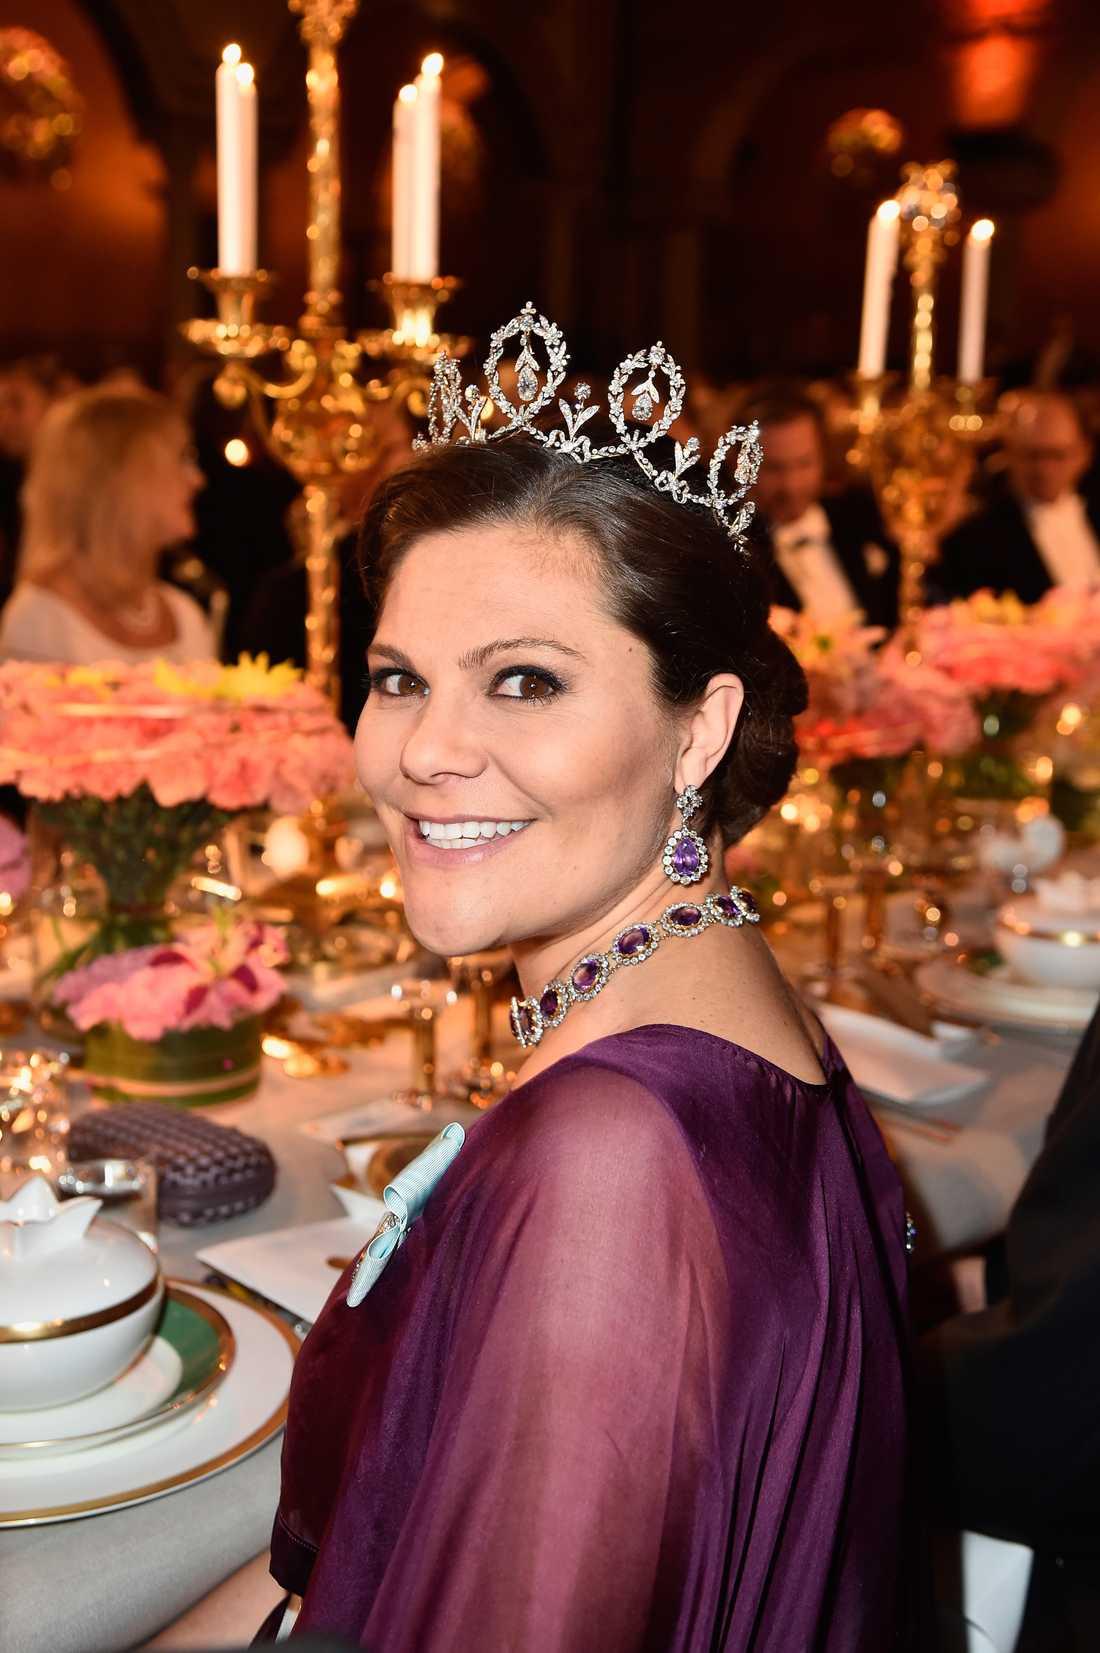 Kronprinsessan Victoria på nobelmiddagen.